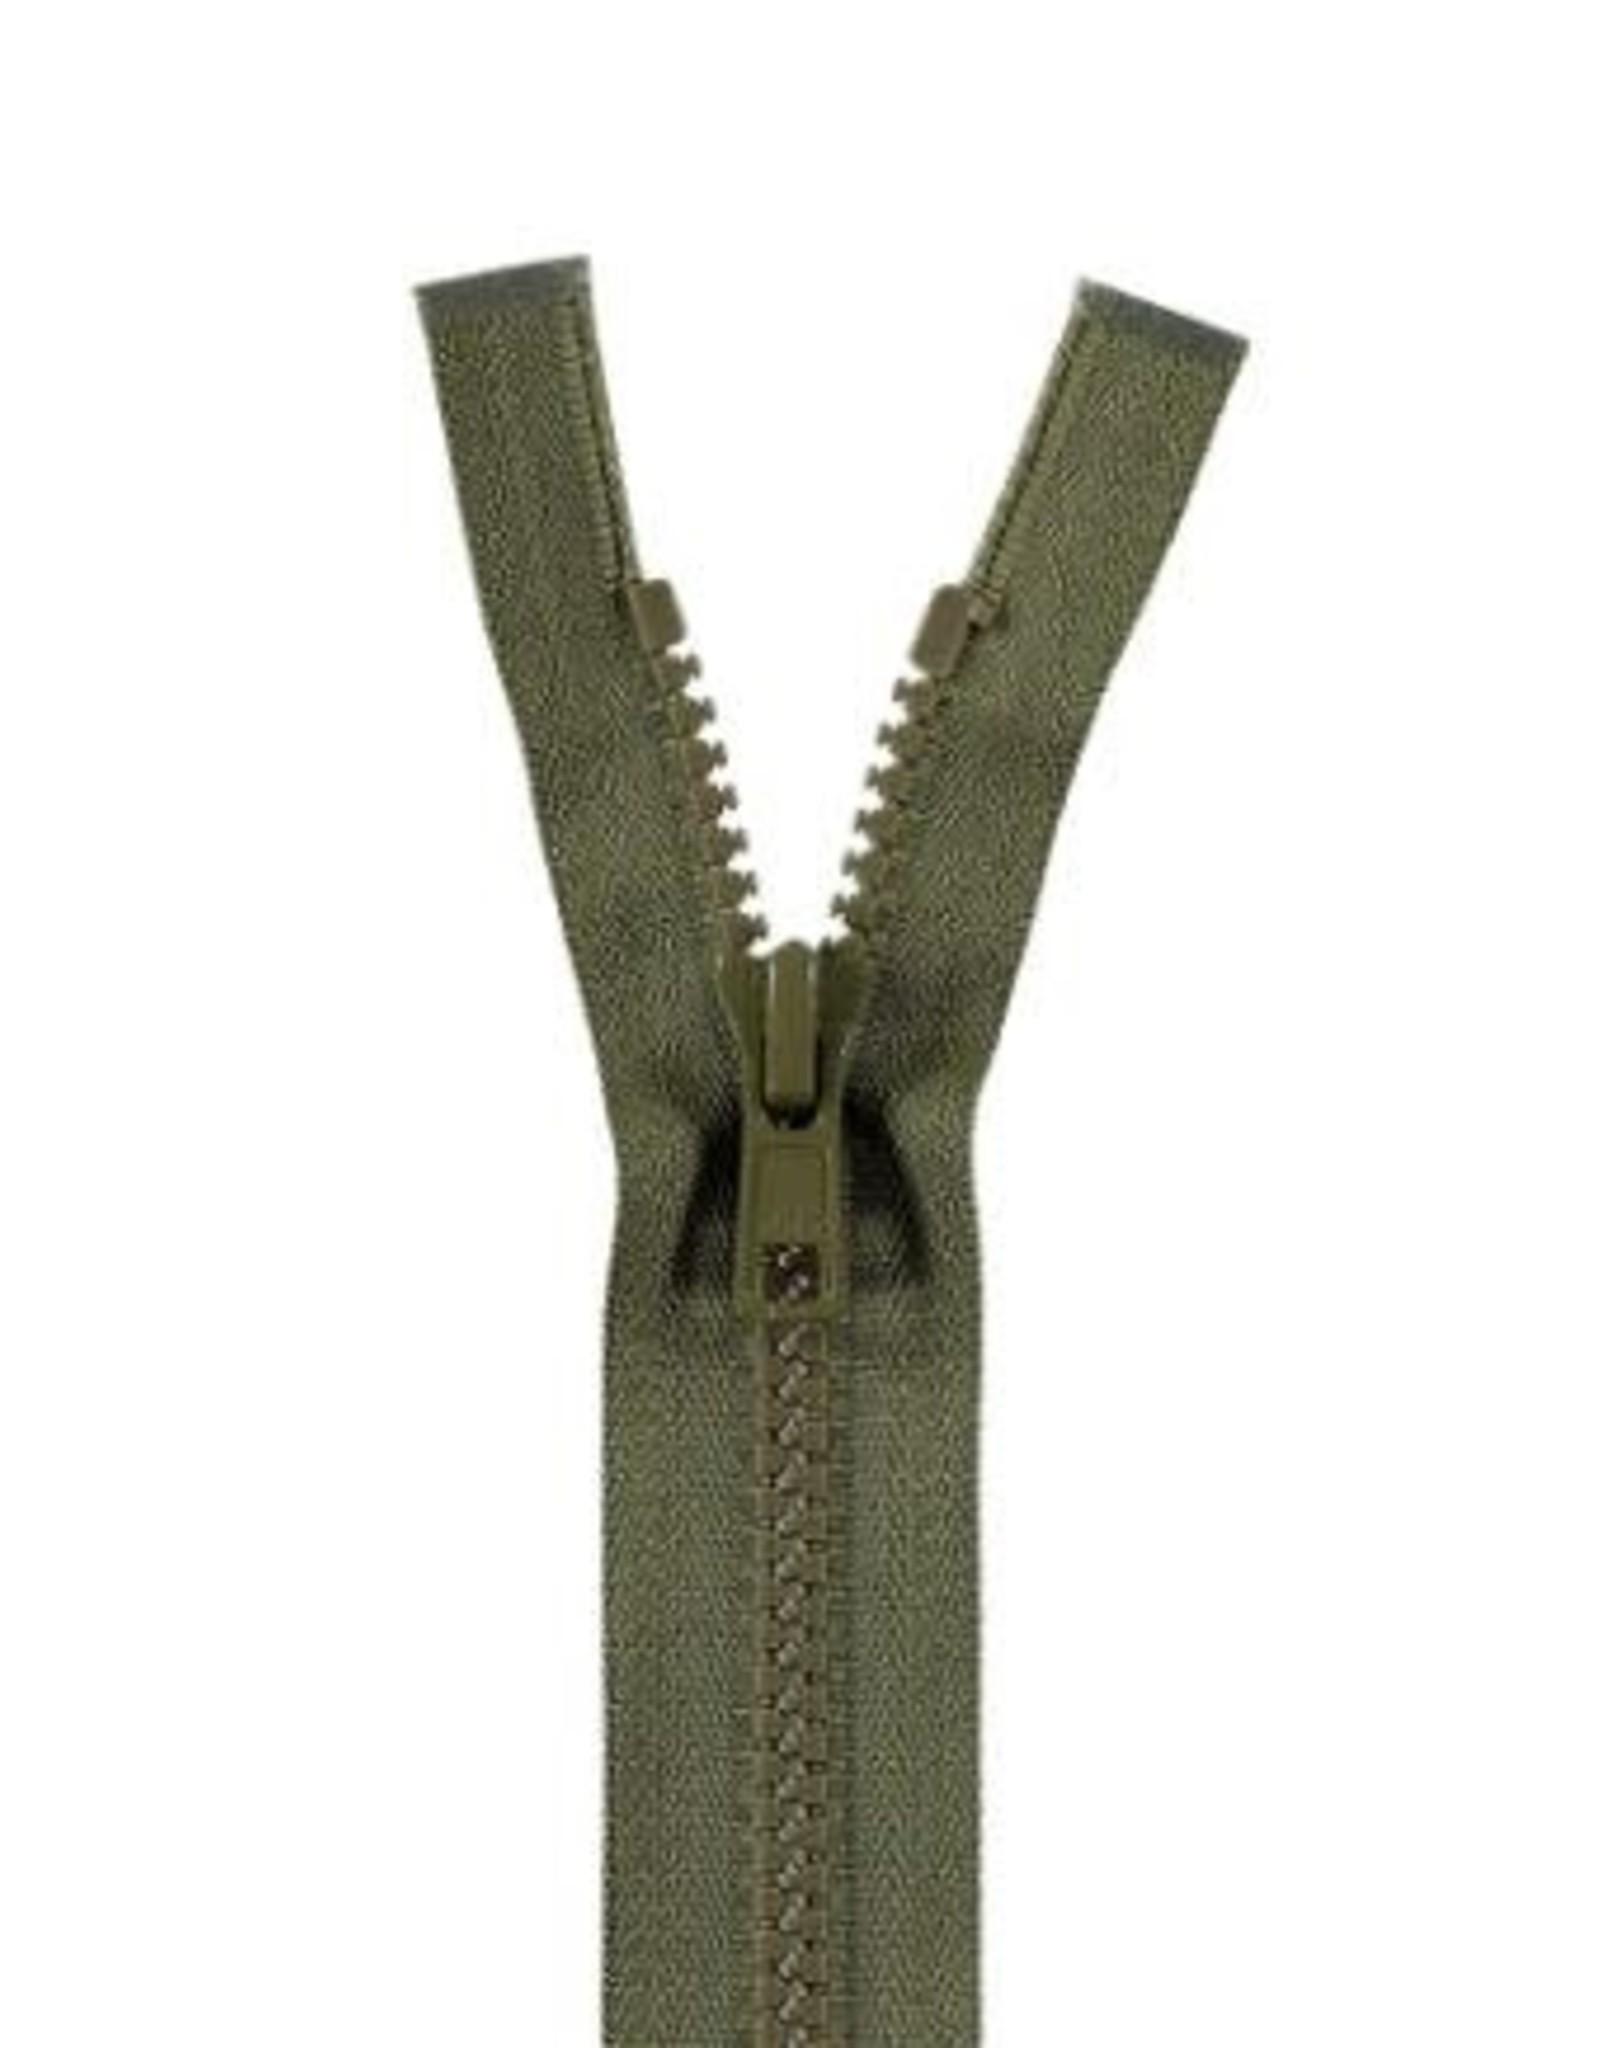 YKK BLOKRITS 5 DEELBAAR legergroen 566-45cm